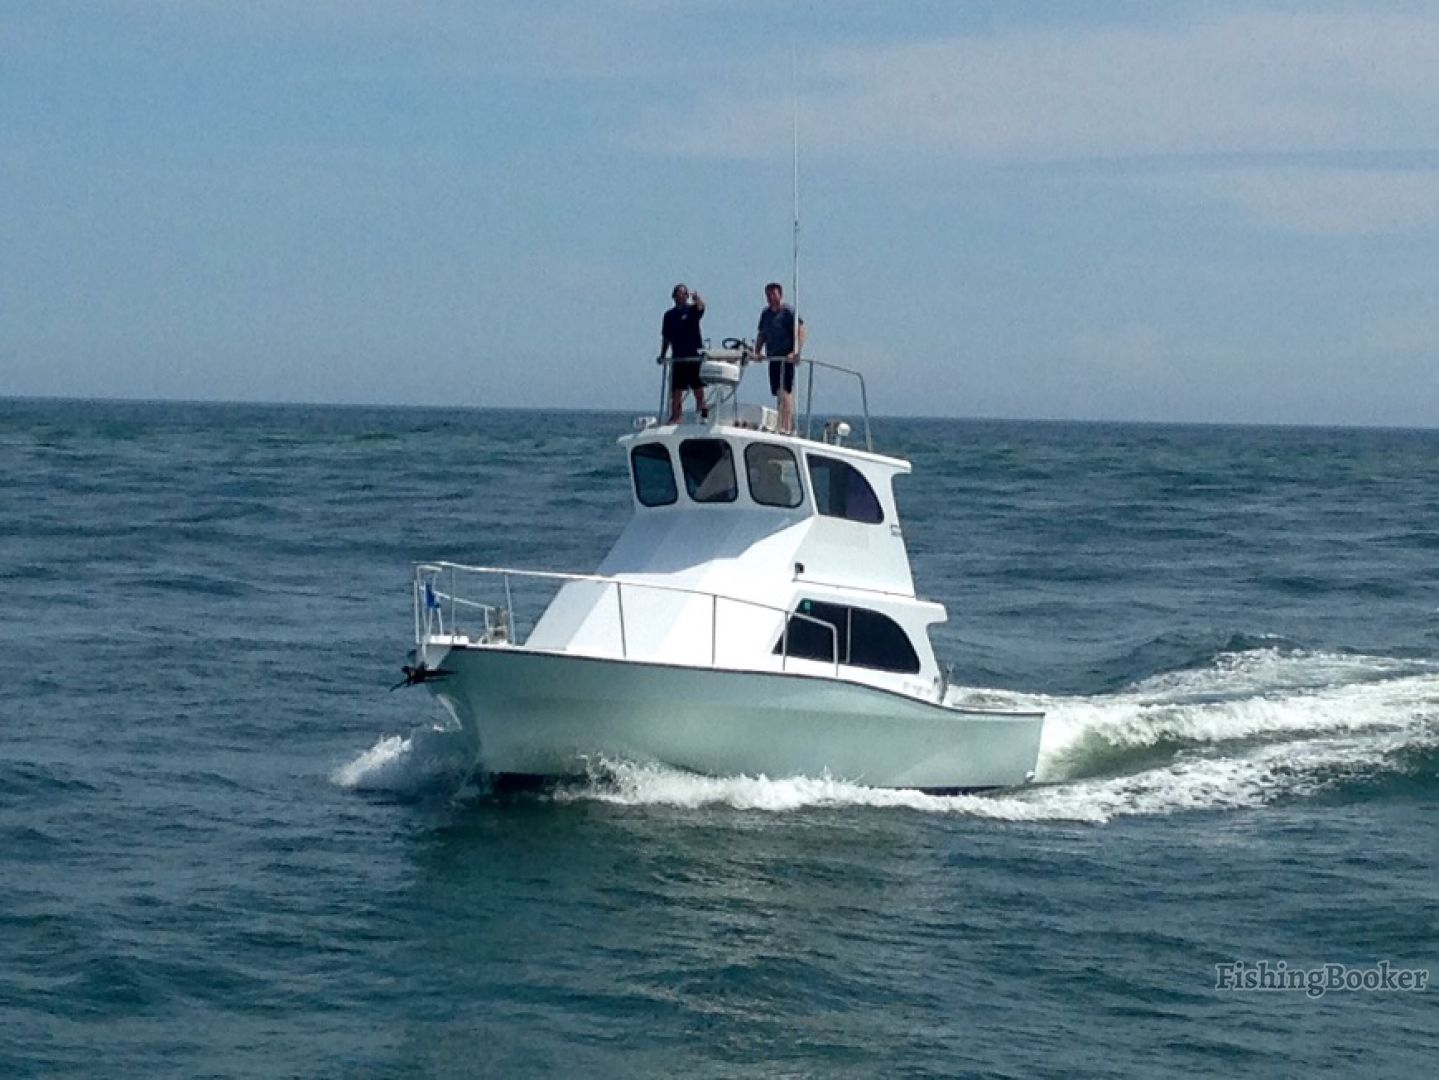 Charter boat striker llc destin florida for Charter fishing destin